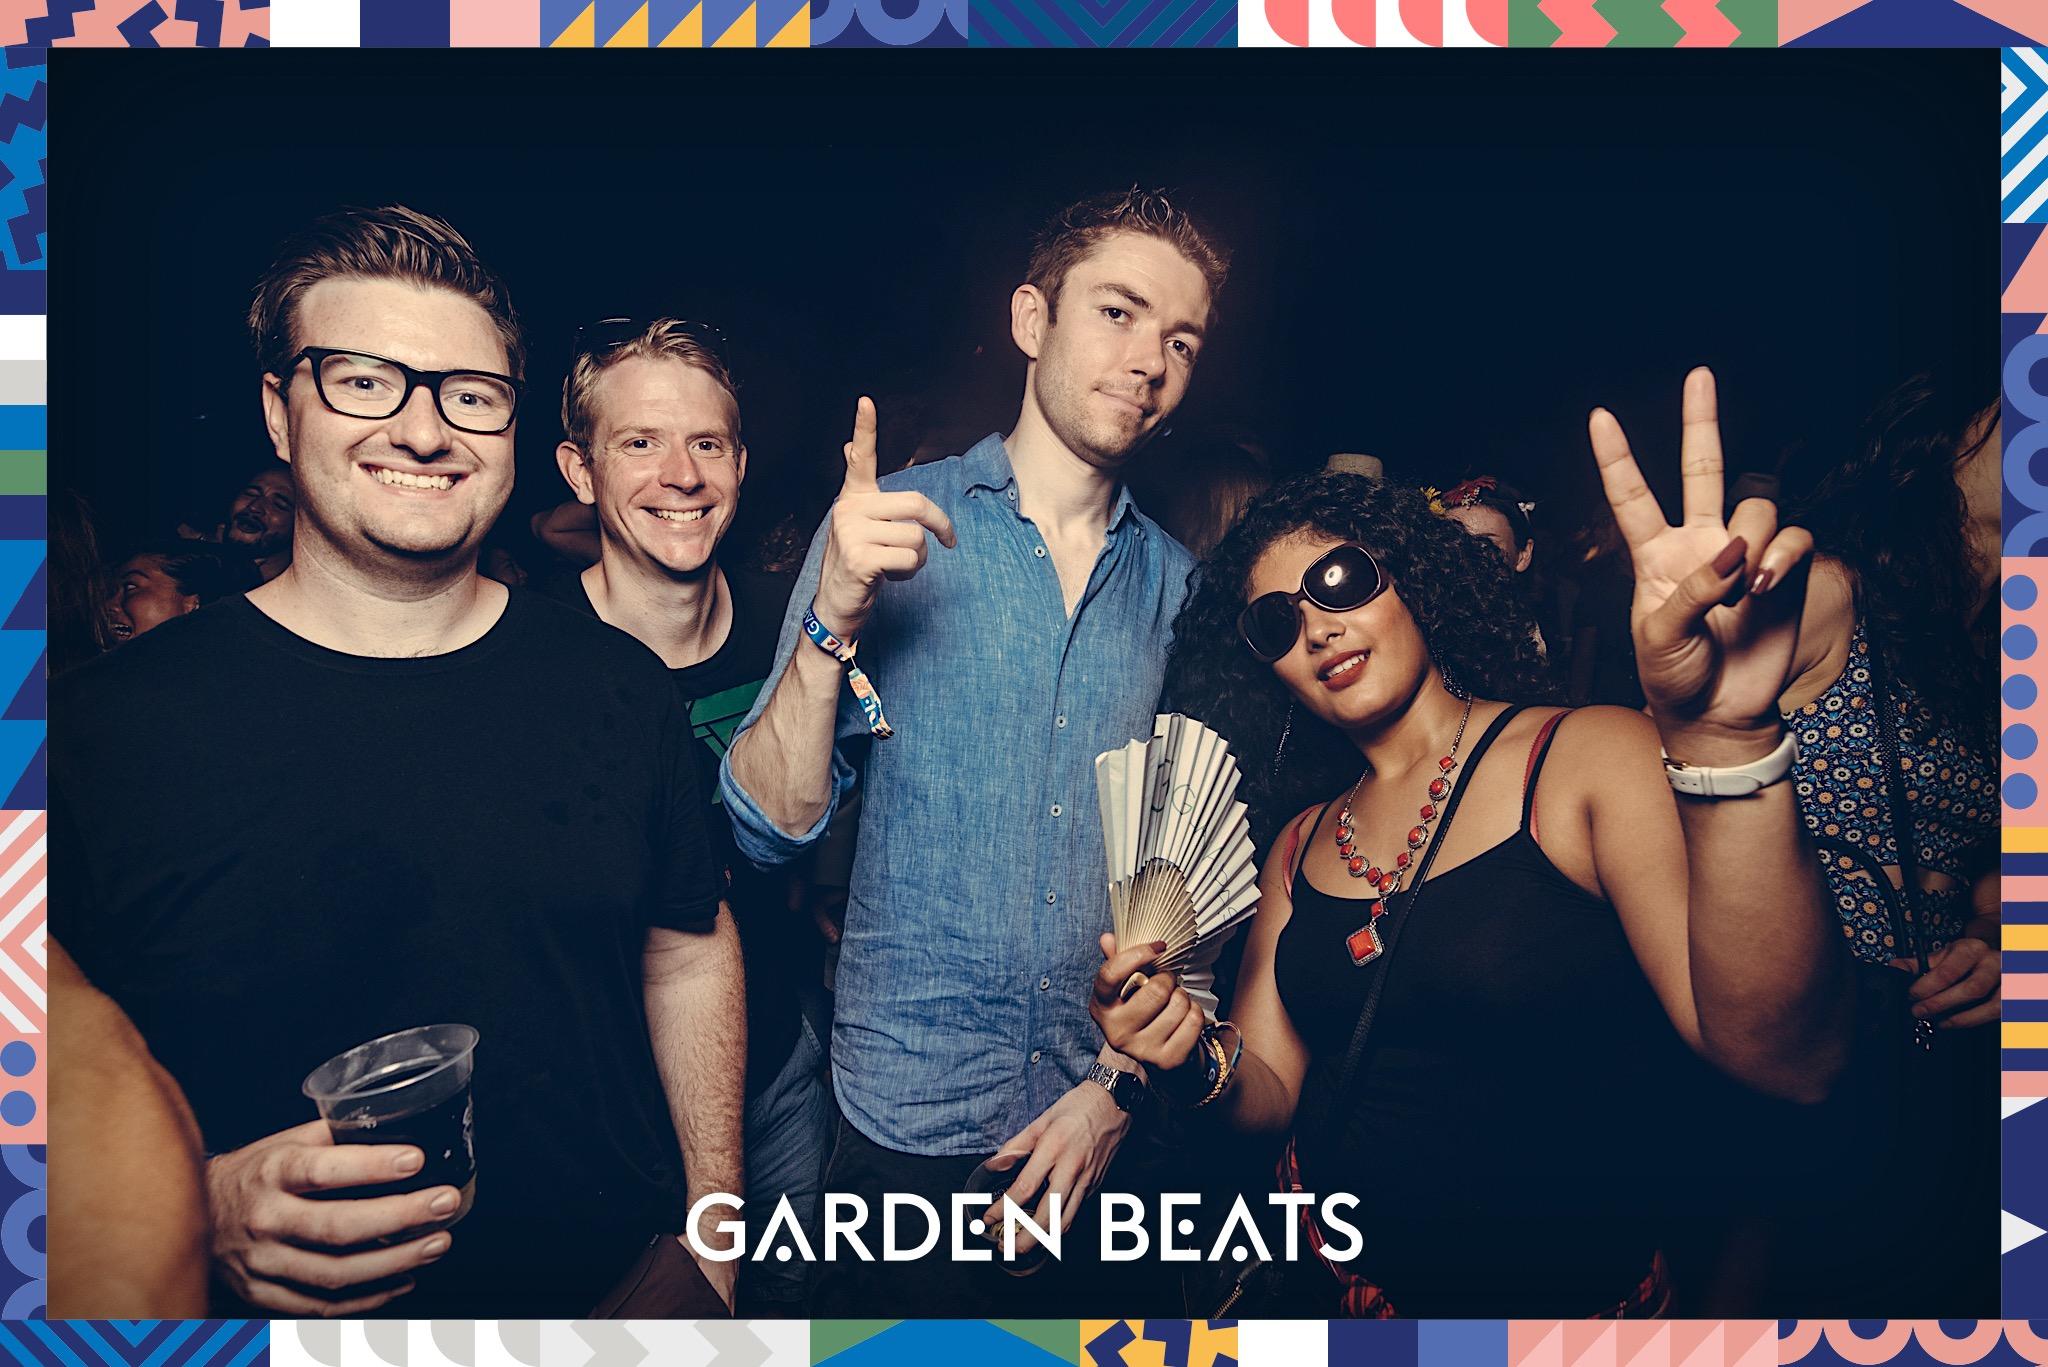 18032017_GardenBeats_Colossal745_WatermarkedGB.jpg